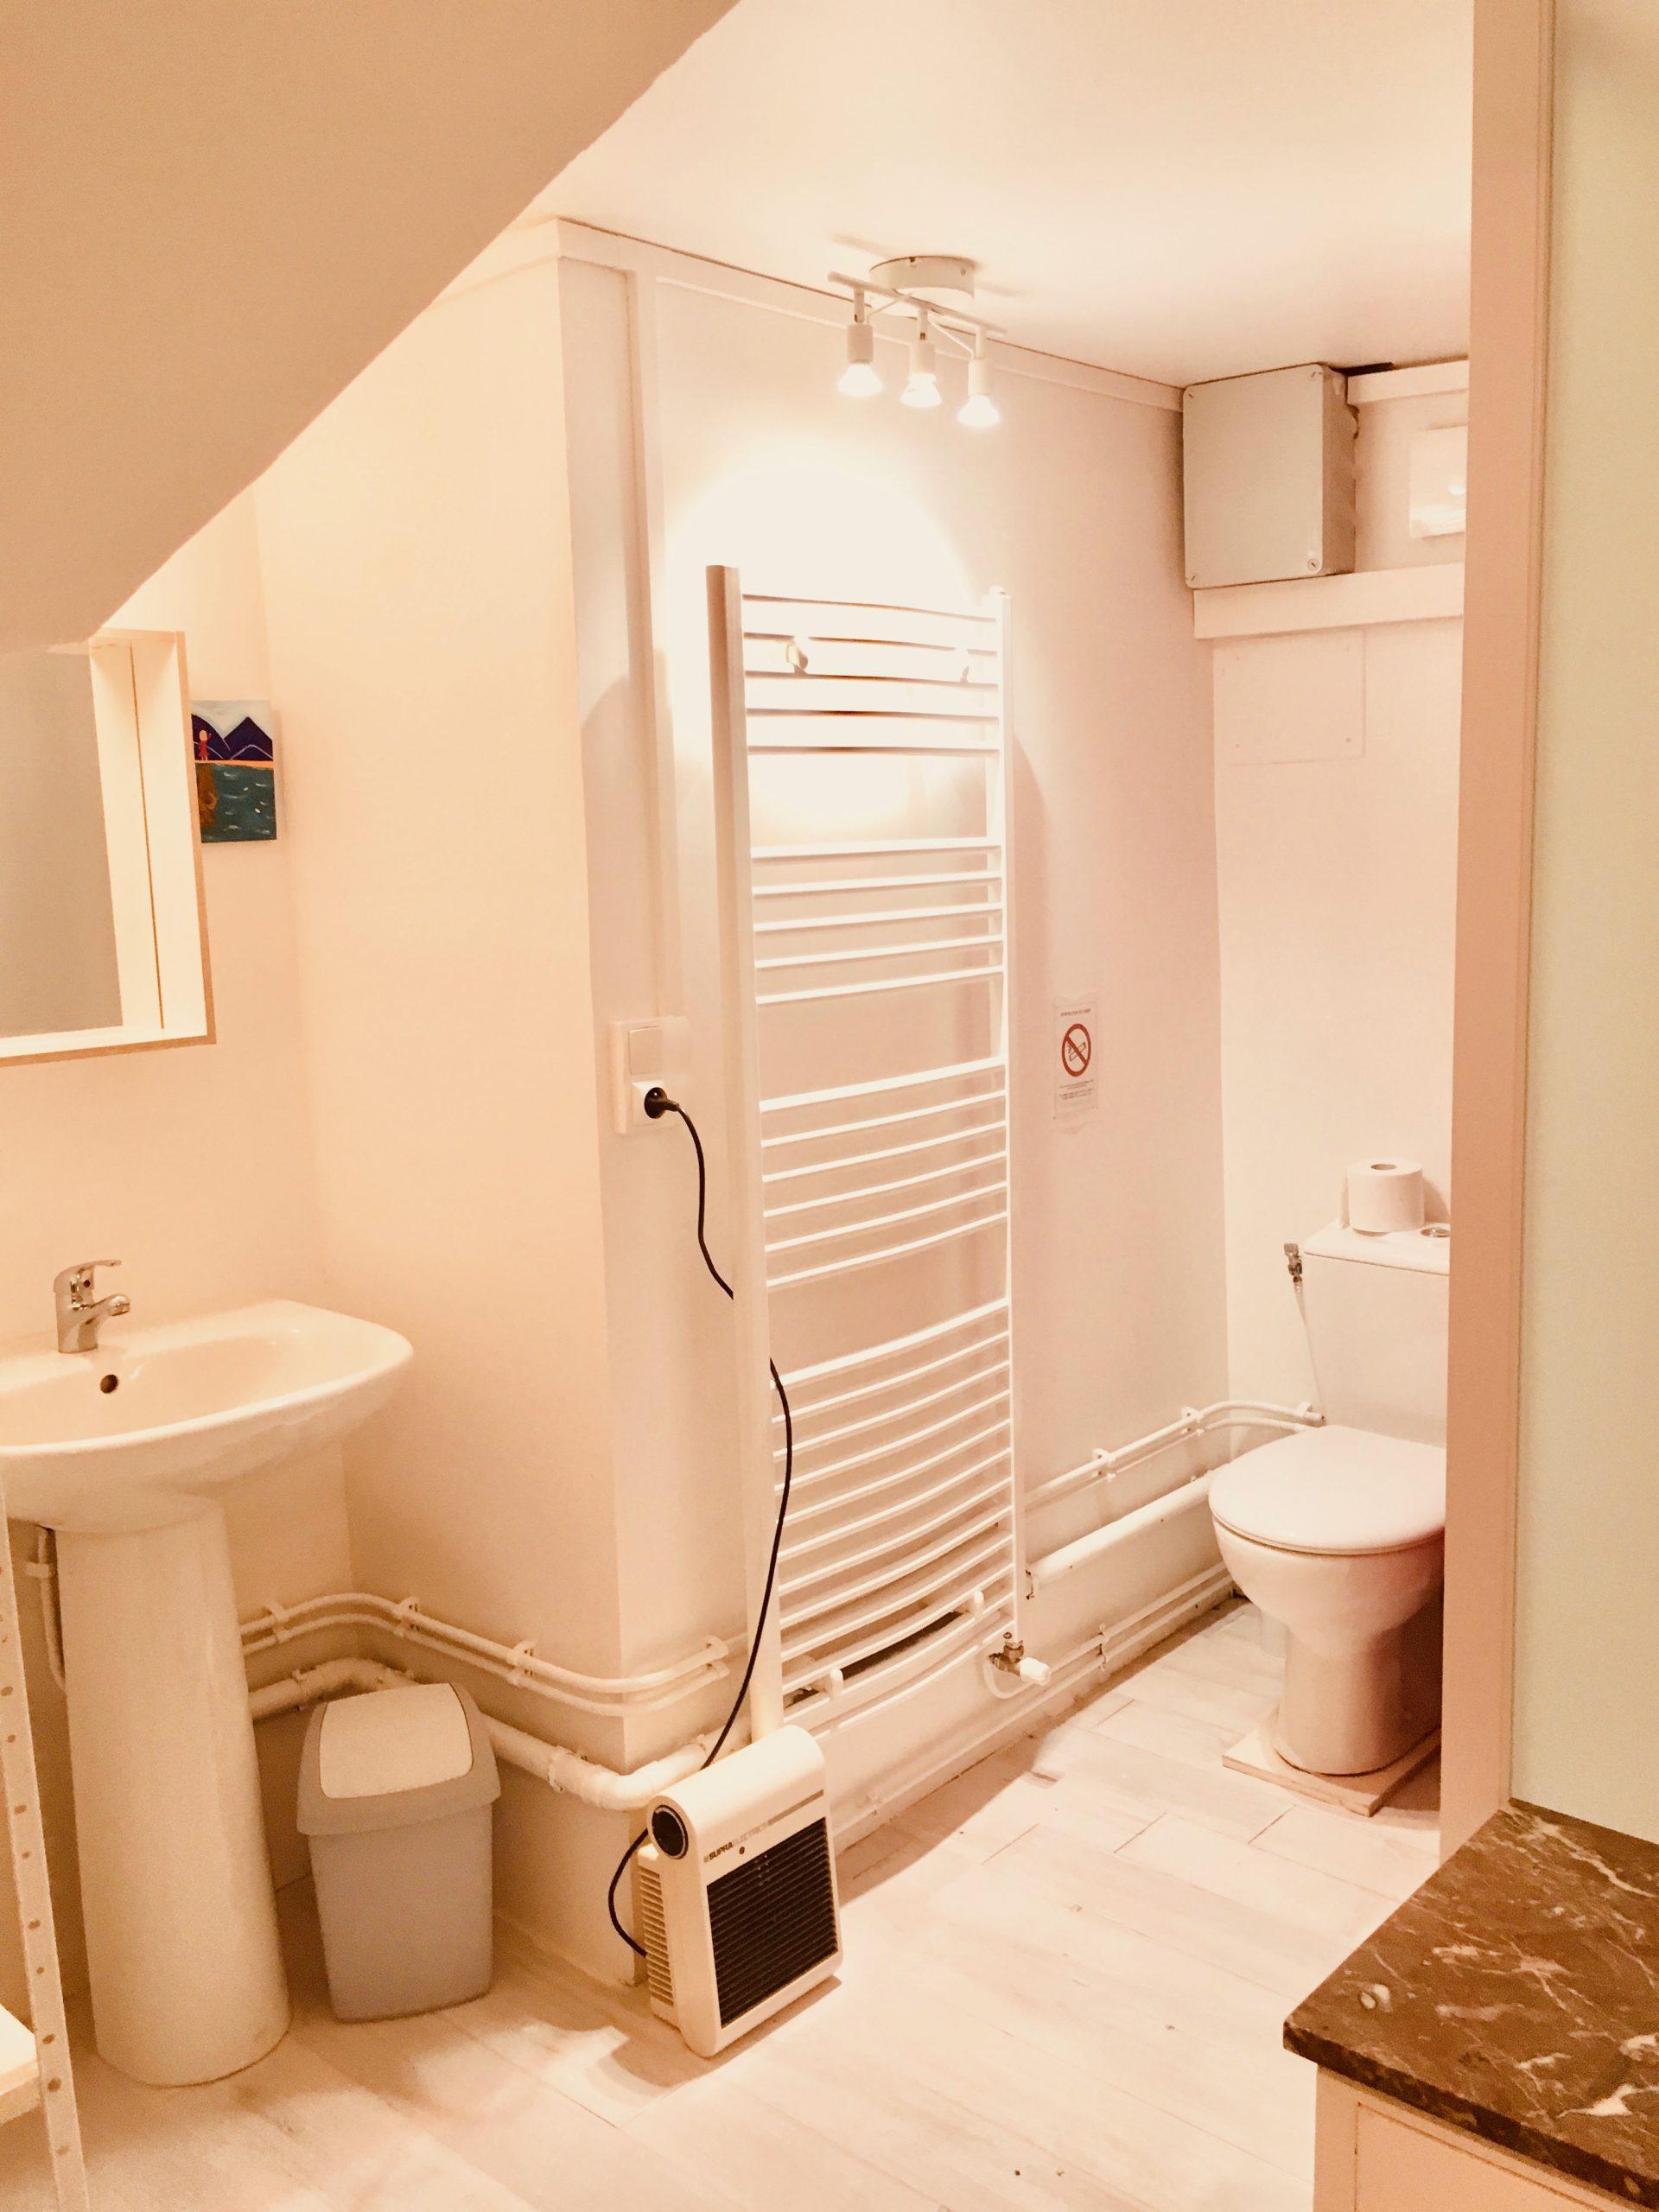 Appartement 2, salle de bain